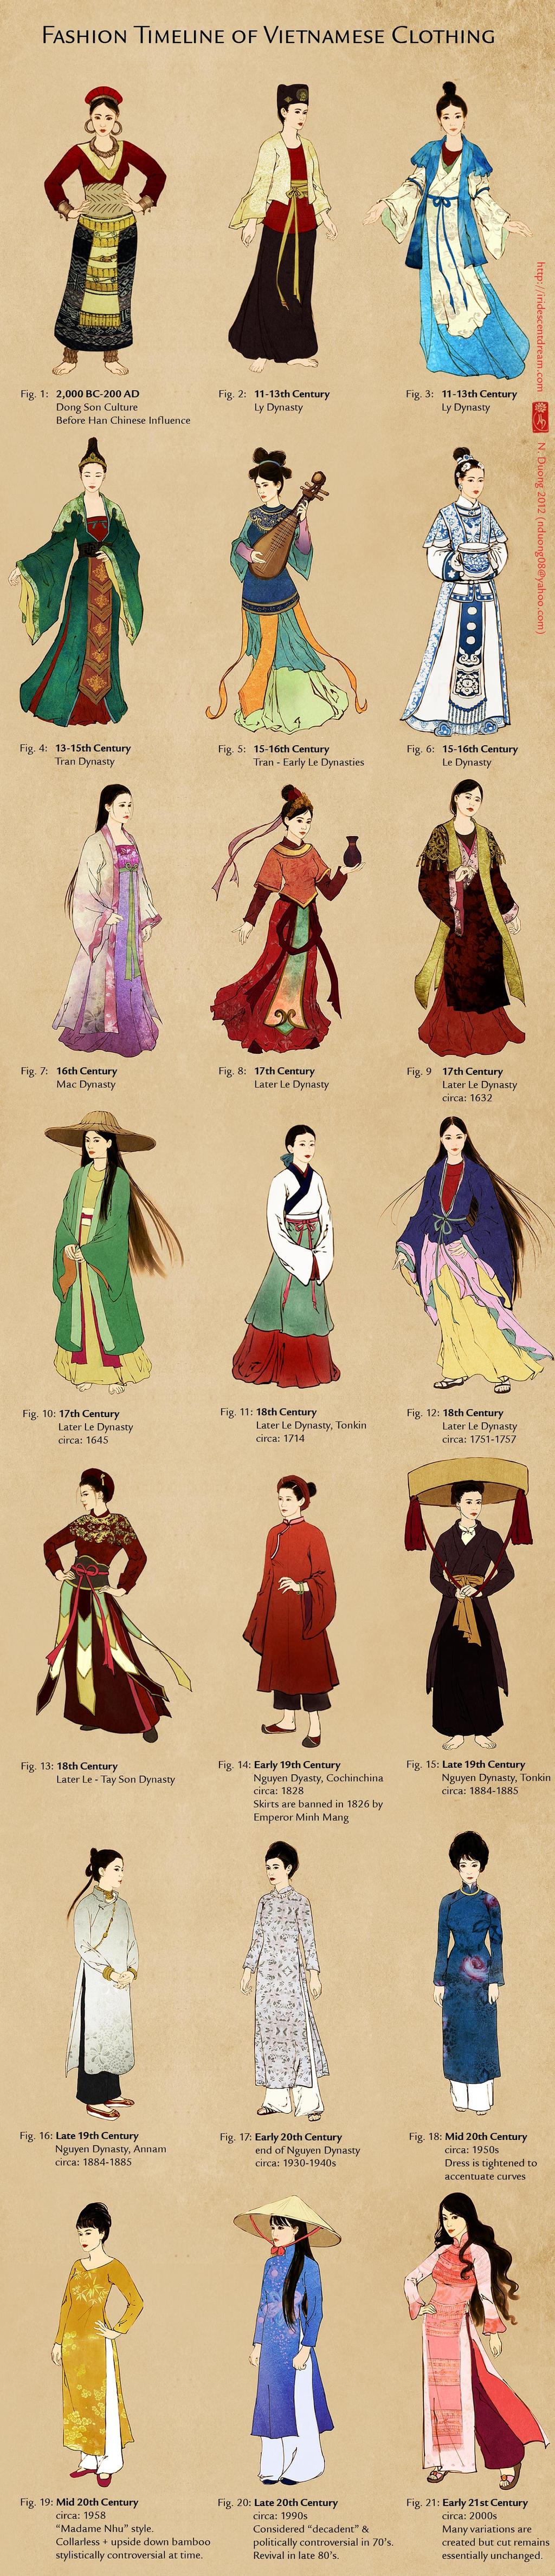 Evolution of Vietnamese Clothing (and Ao Dai)